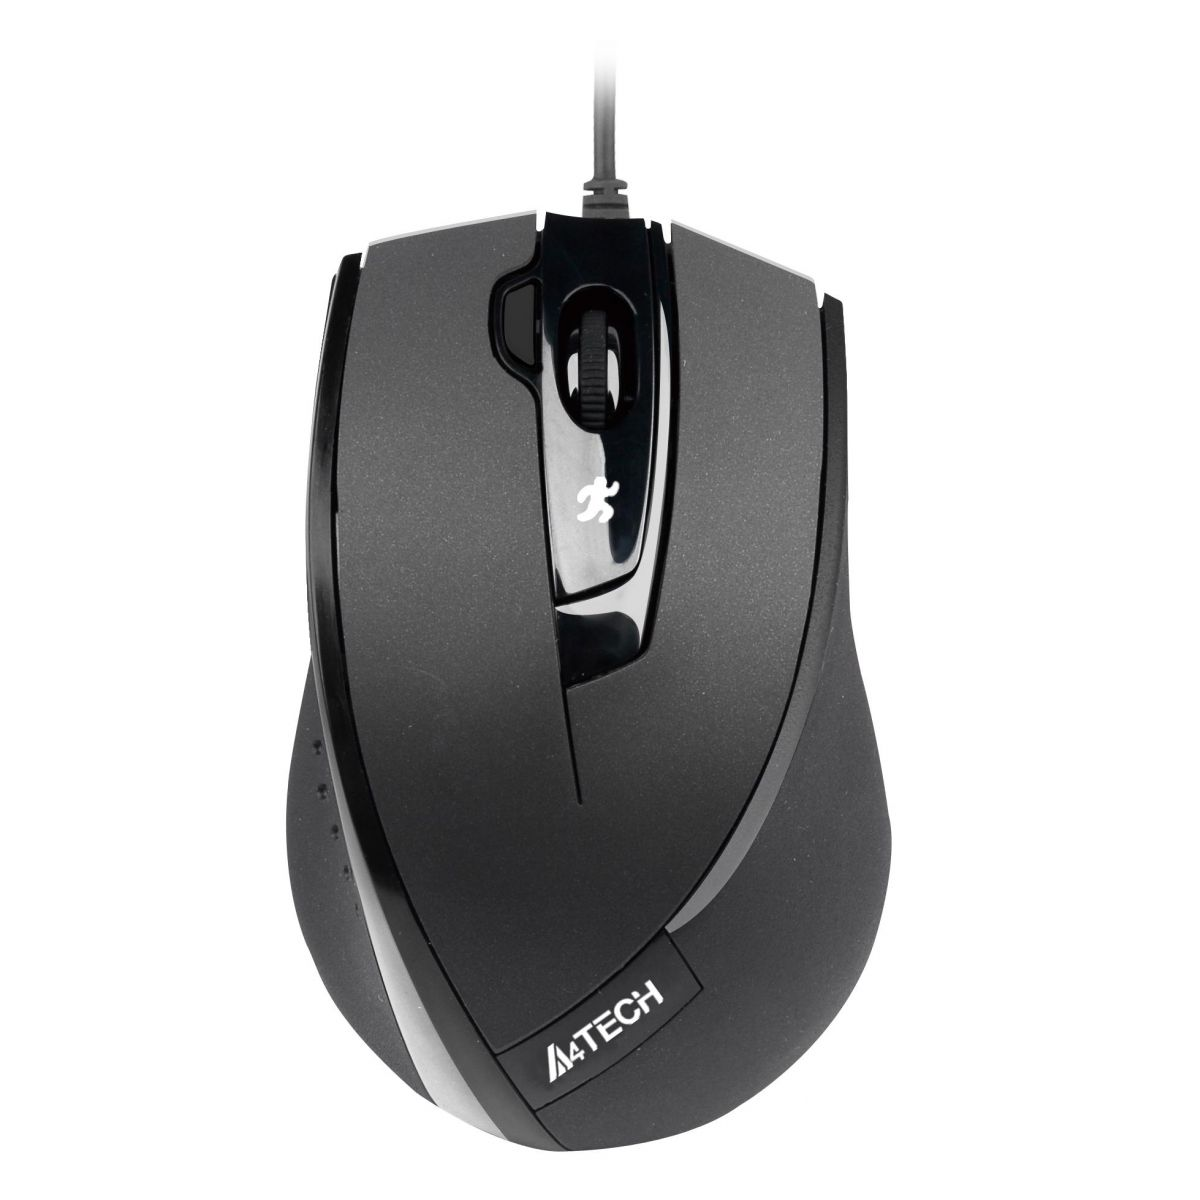 Mouse V-Track N-600X Black - A4tech